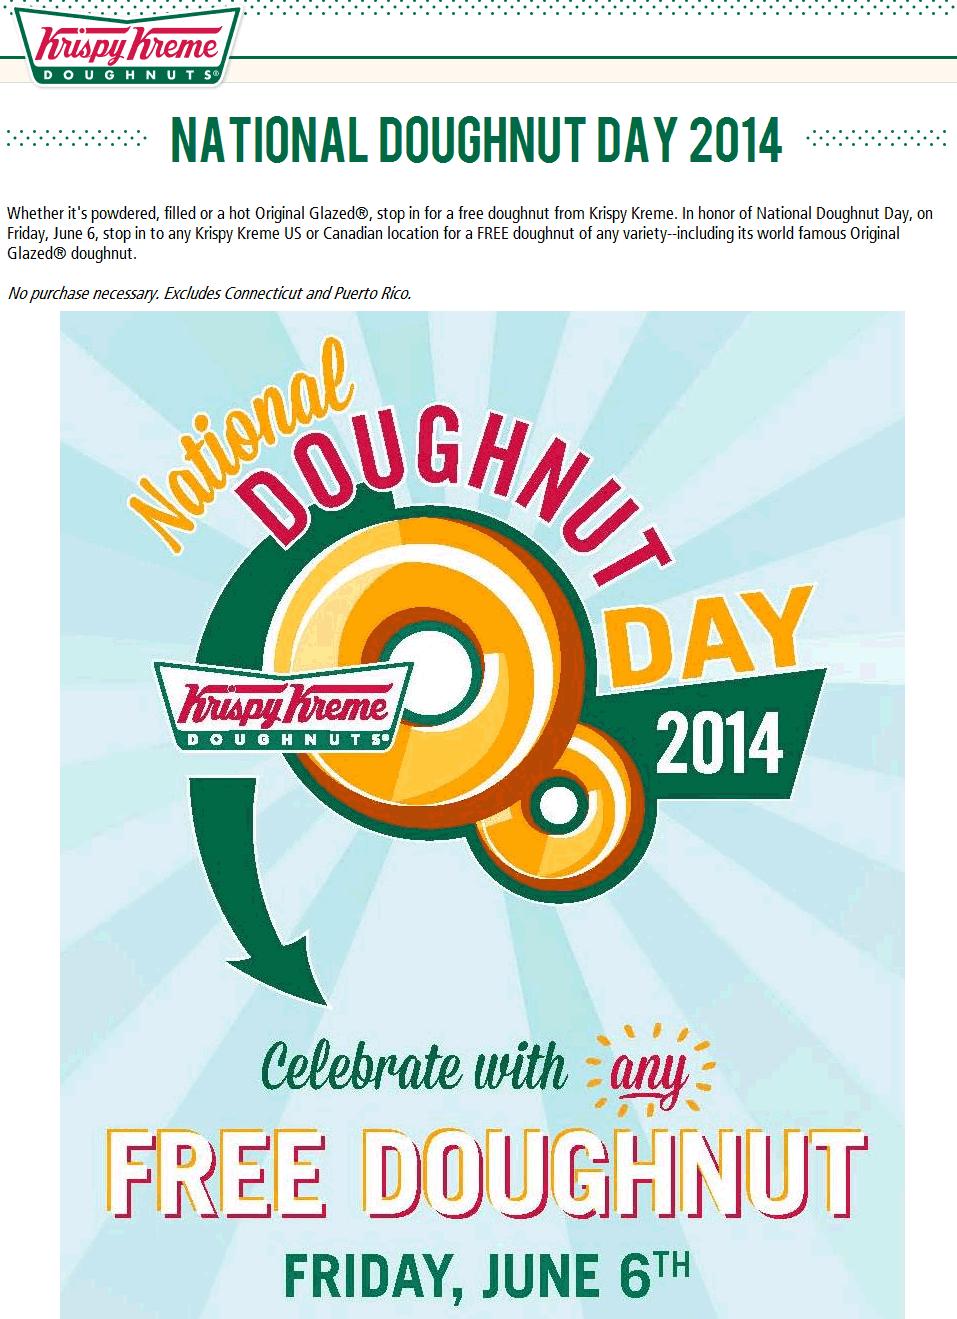 Pinned May 30th Free doughnut the 6th at KrispyKreme, no